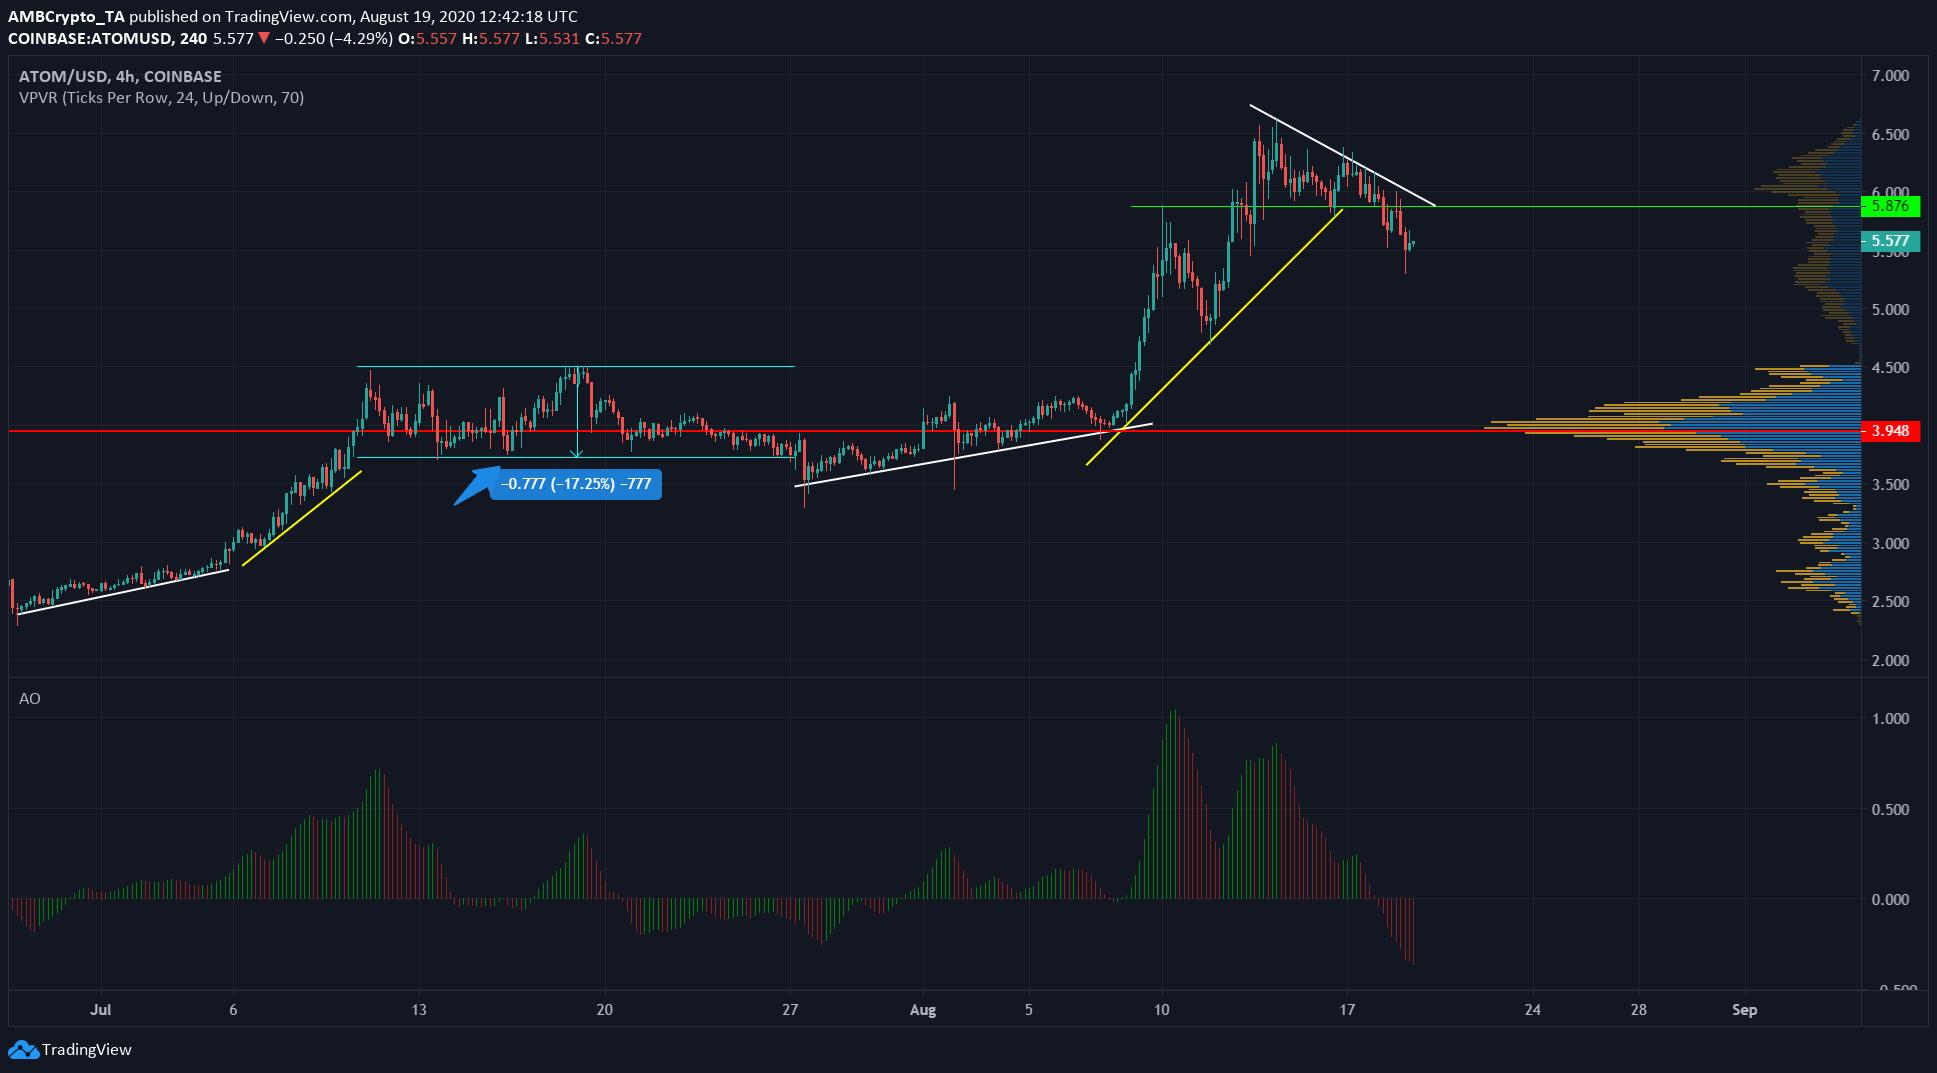 Bitcoin SV, Cosmos, Synthetix Price Analysis: 19 August